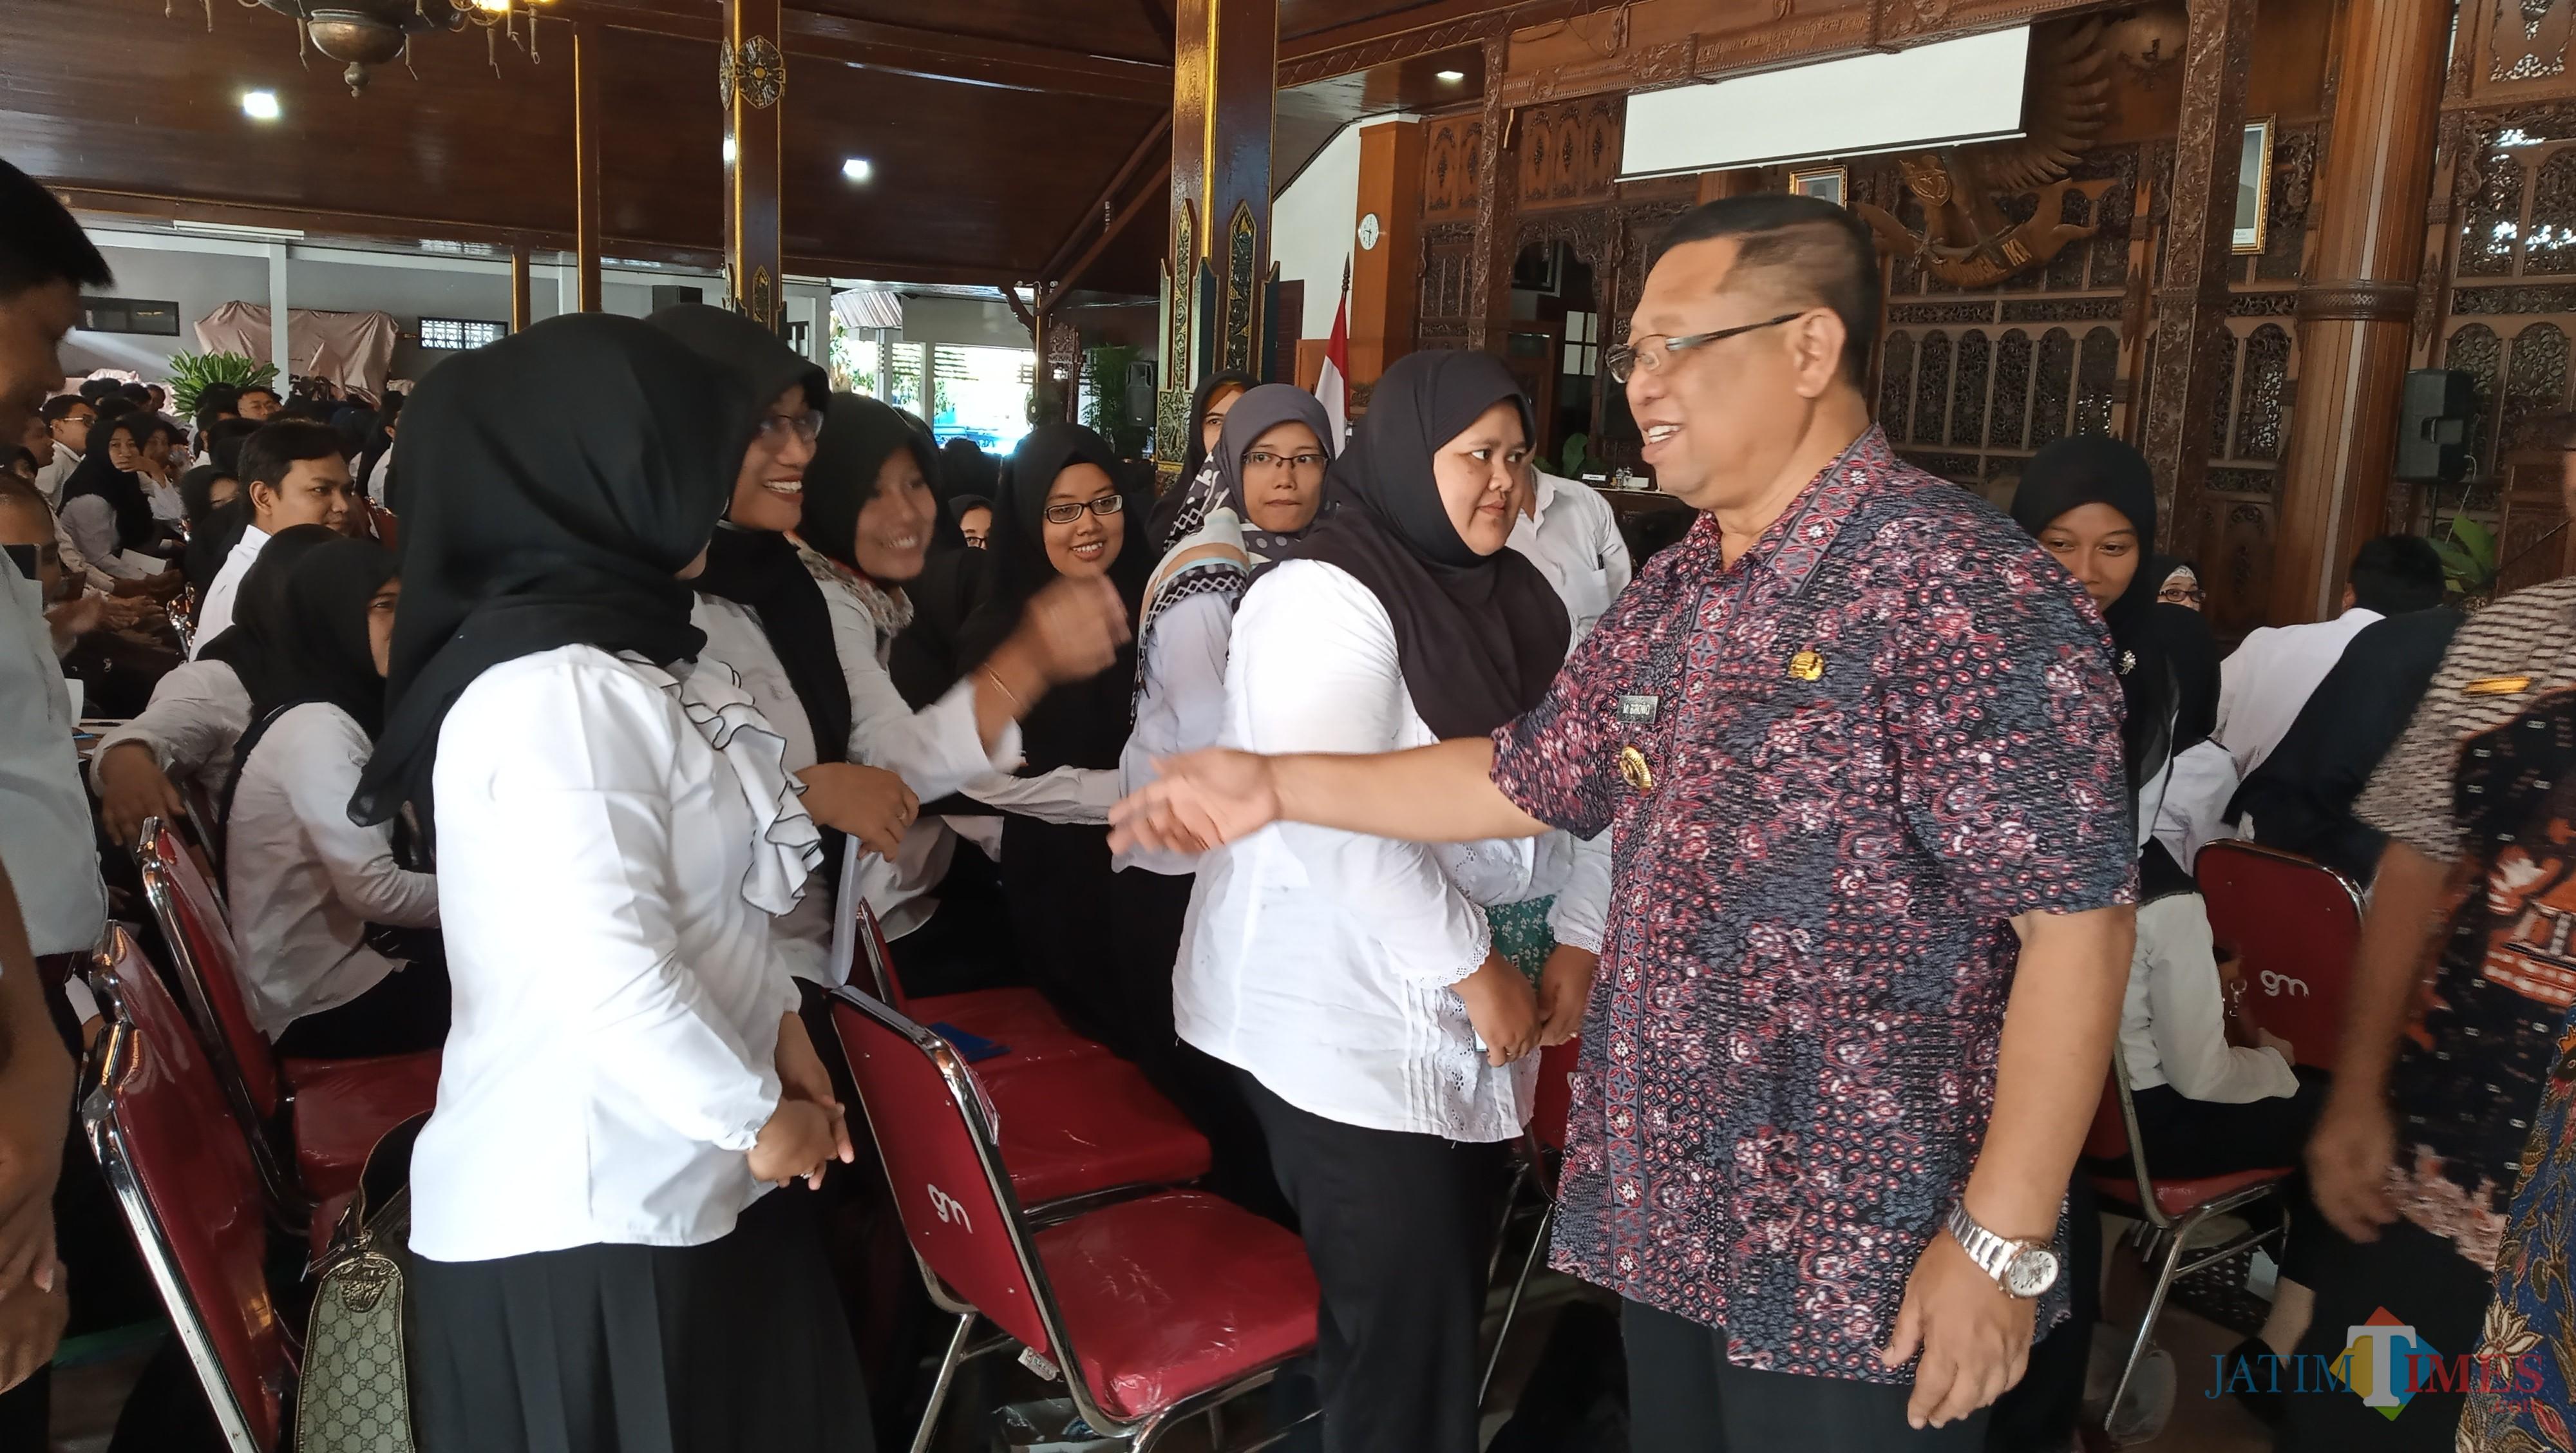 Plt Bupati Tulungagung Maryoto Birowo saat memberika selamat kepada CASN yang lolos seleksi. (foto : Joko Pramono/Tulungagungtimes)